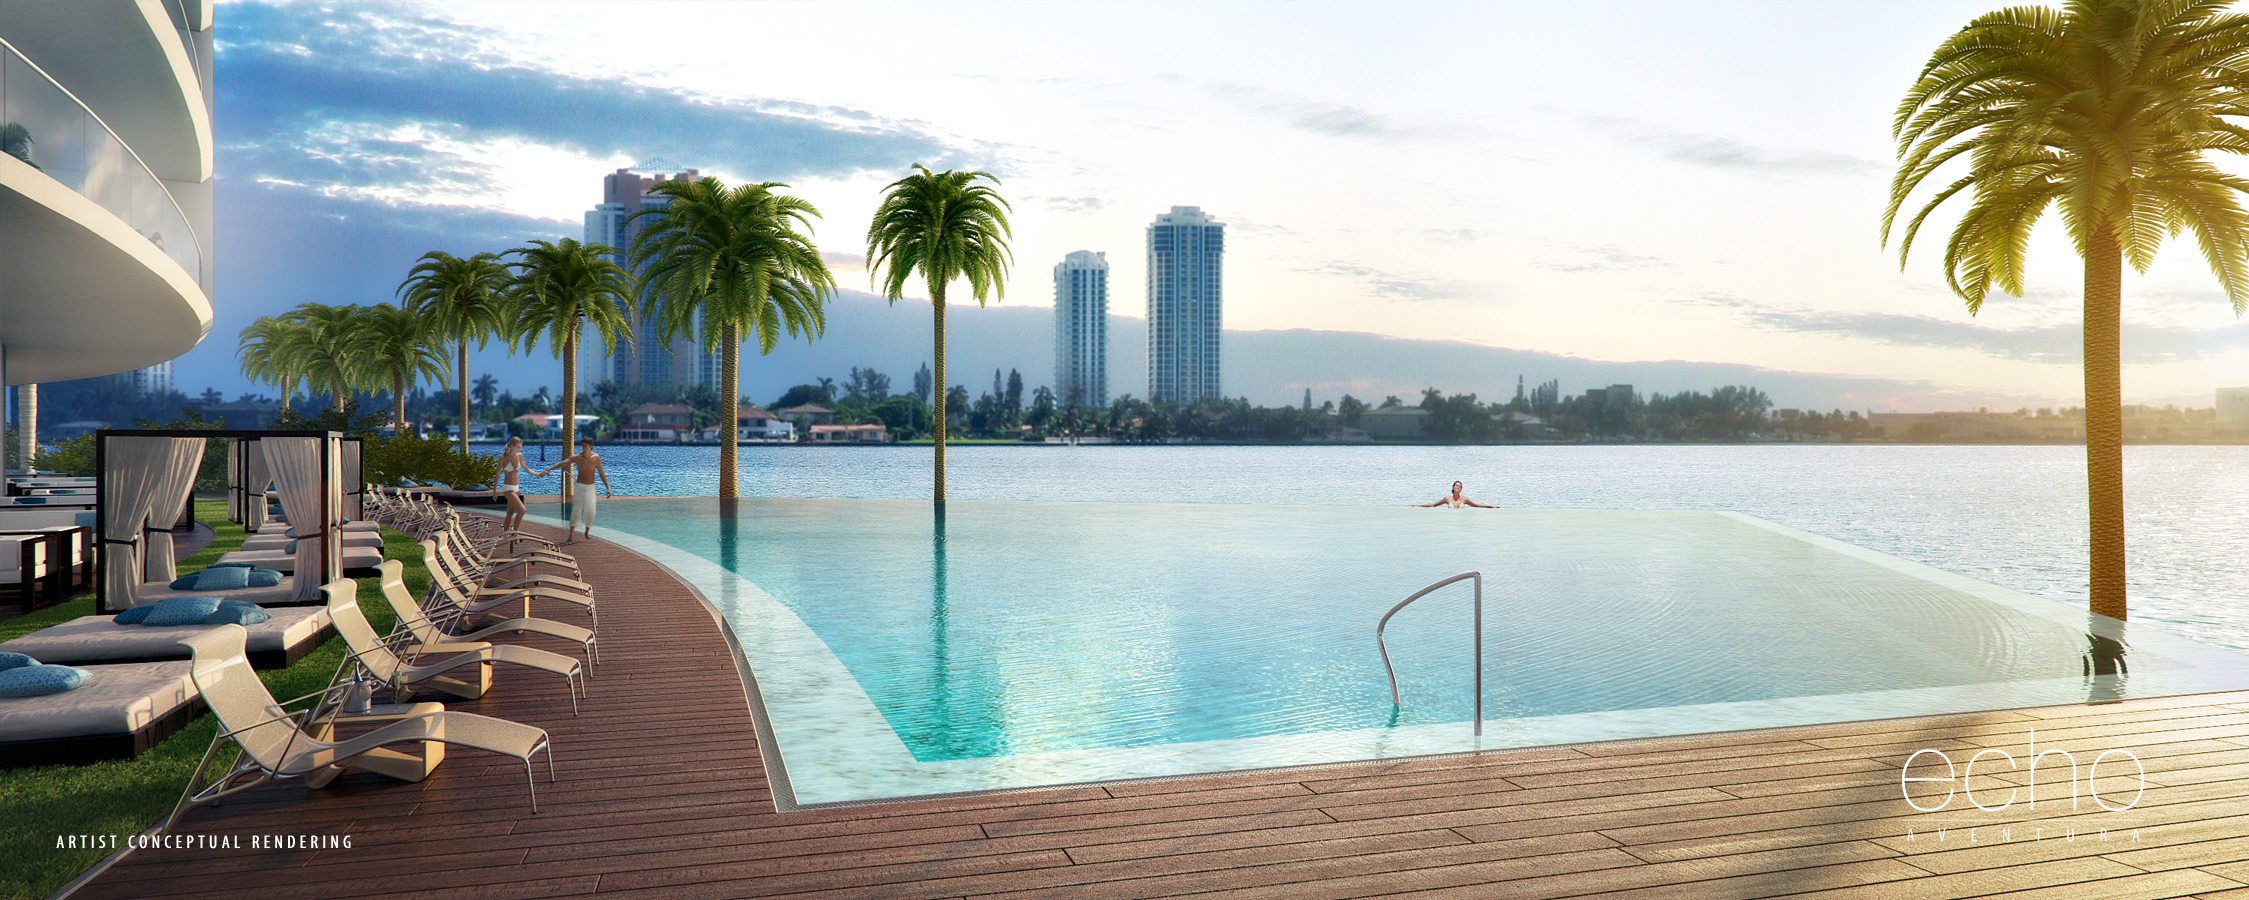 Echo aventura miami partners realty for Pool design ventura